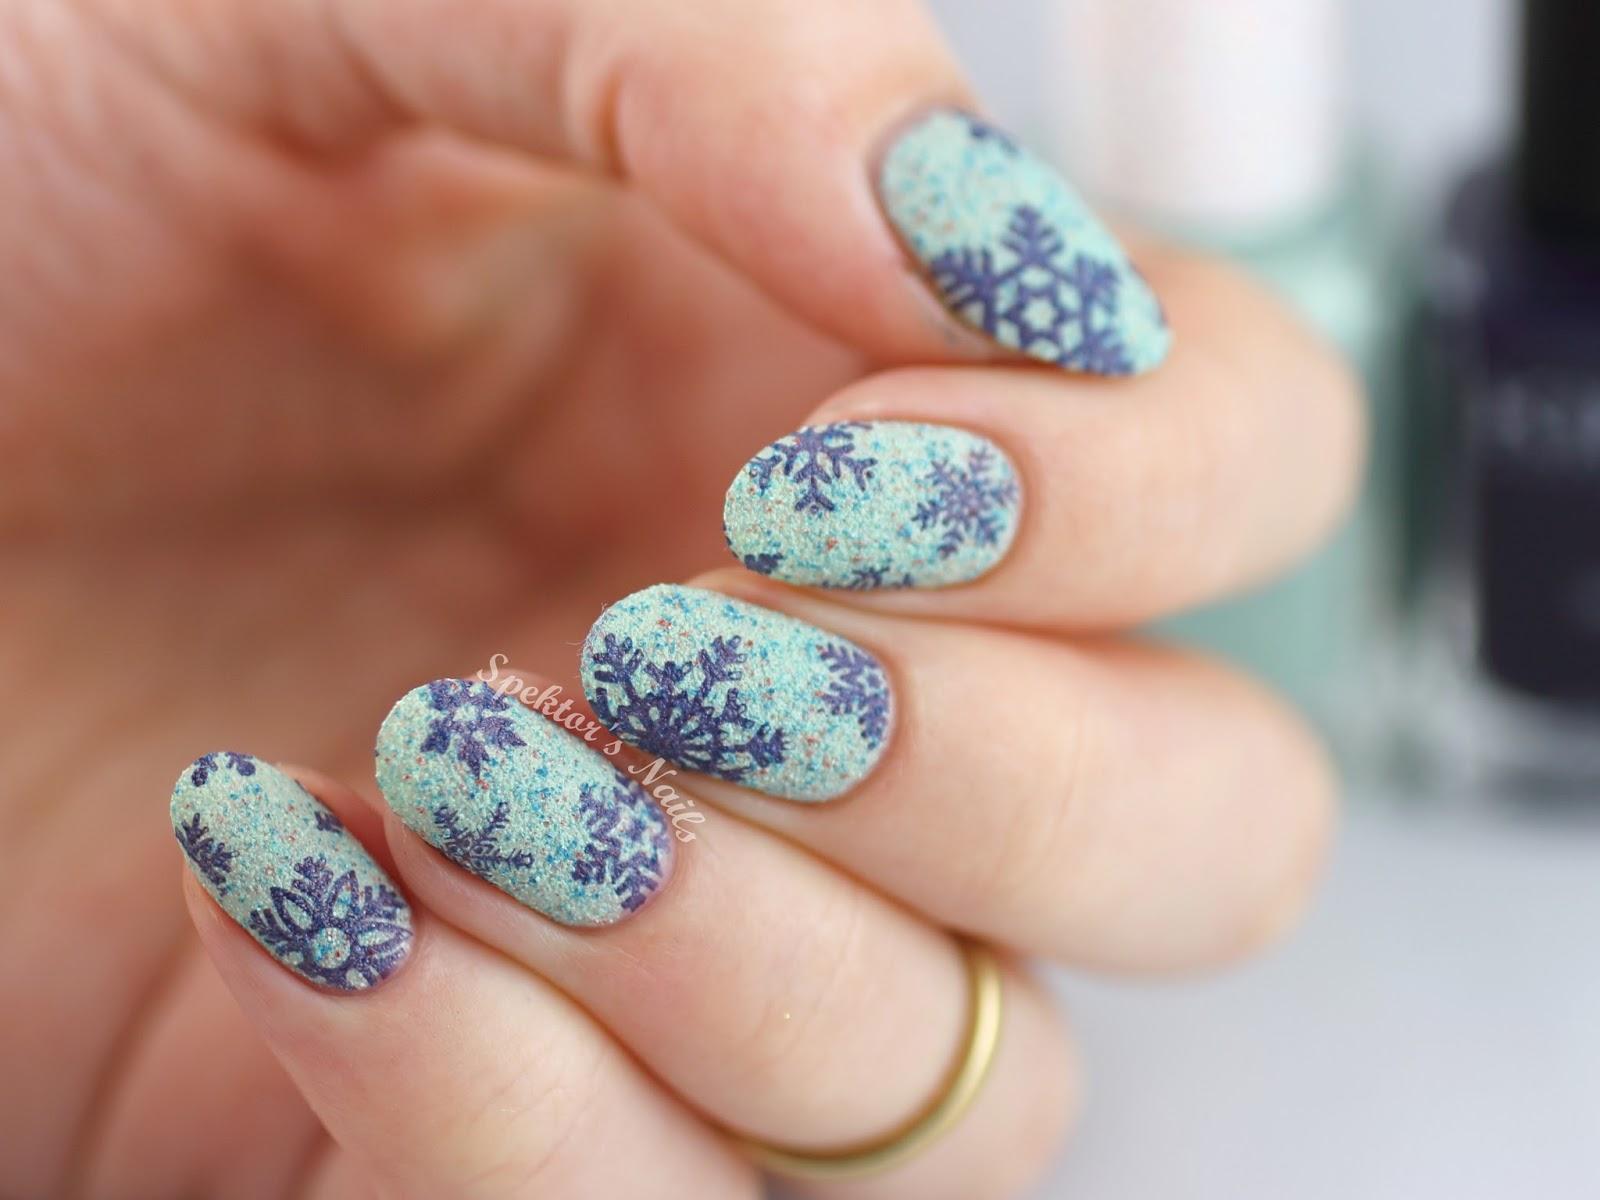 Snowflake Nails - Textured Stamping MoYou London Christmas Collection & Kiko Cosmetics